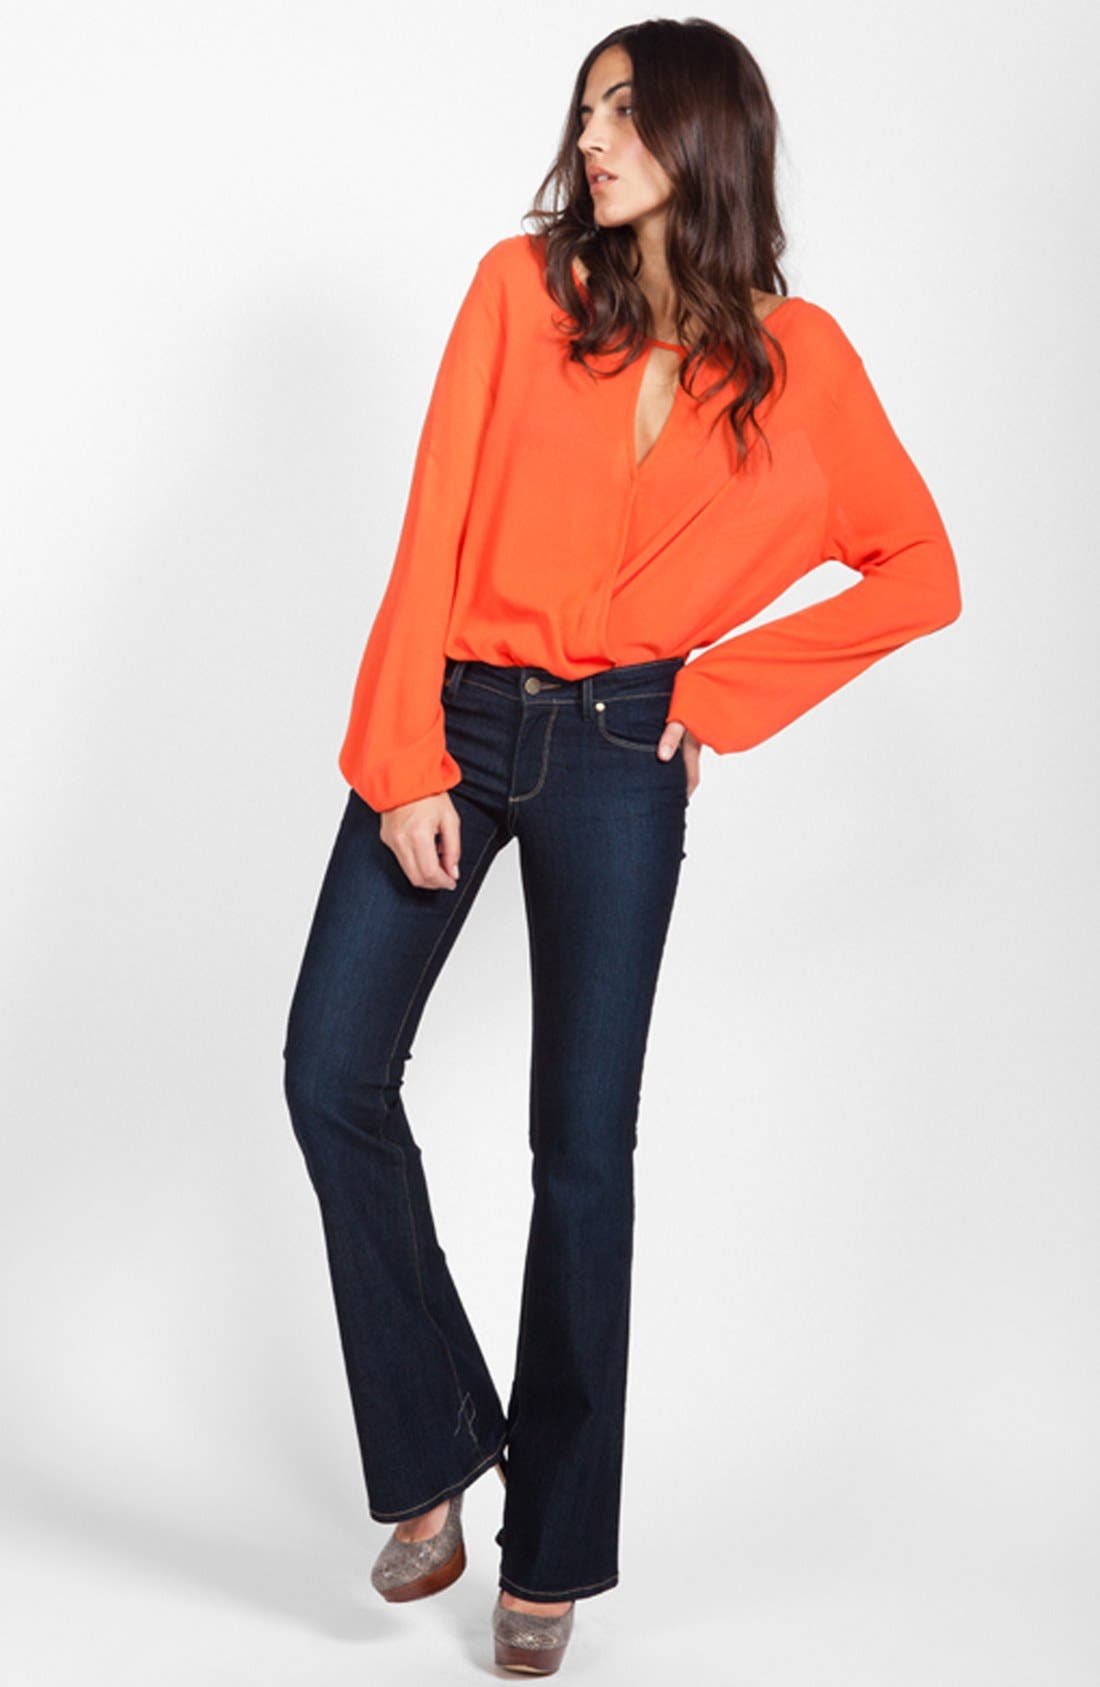 Main Image - Ella Moss Top & Paige Jeans